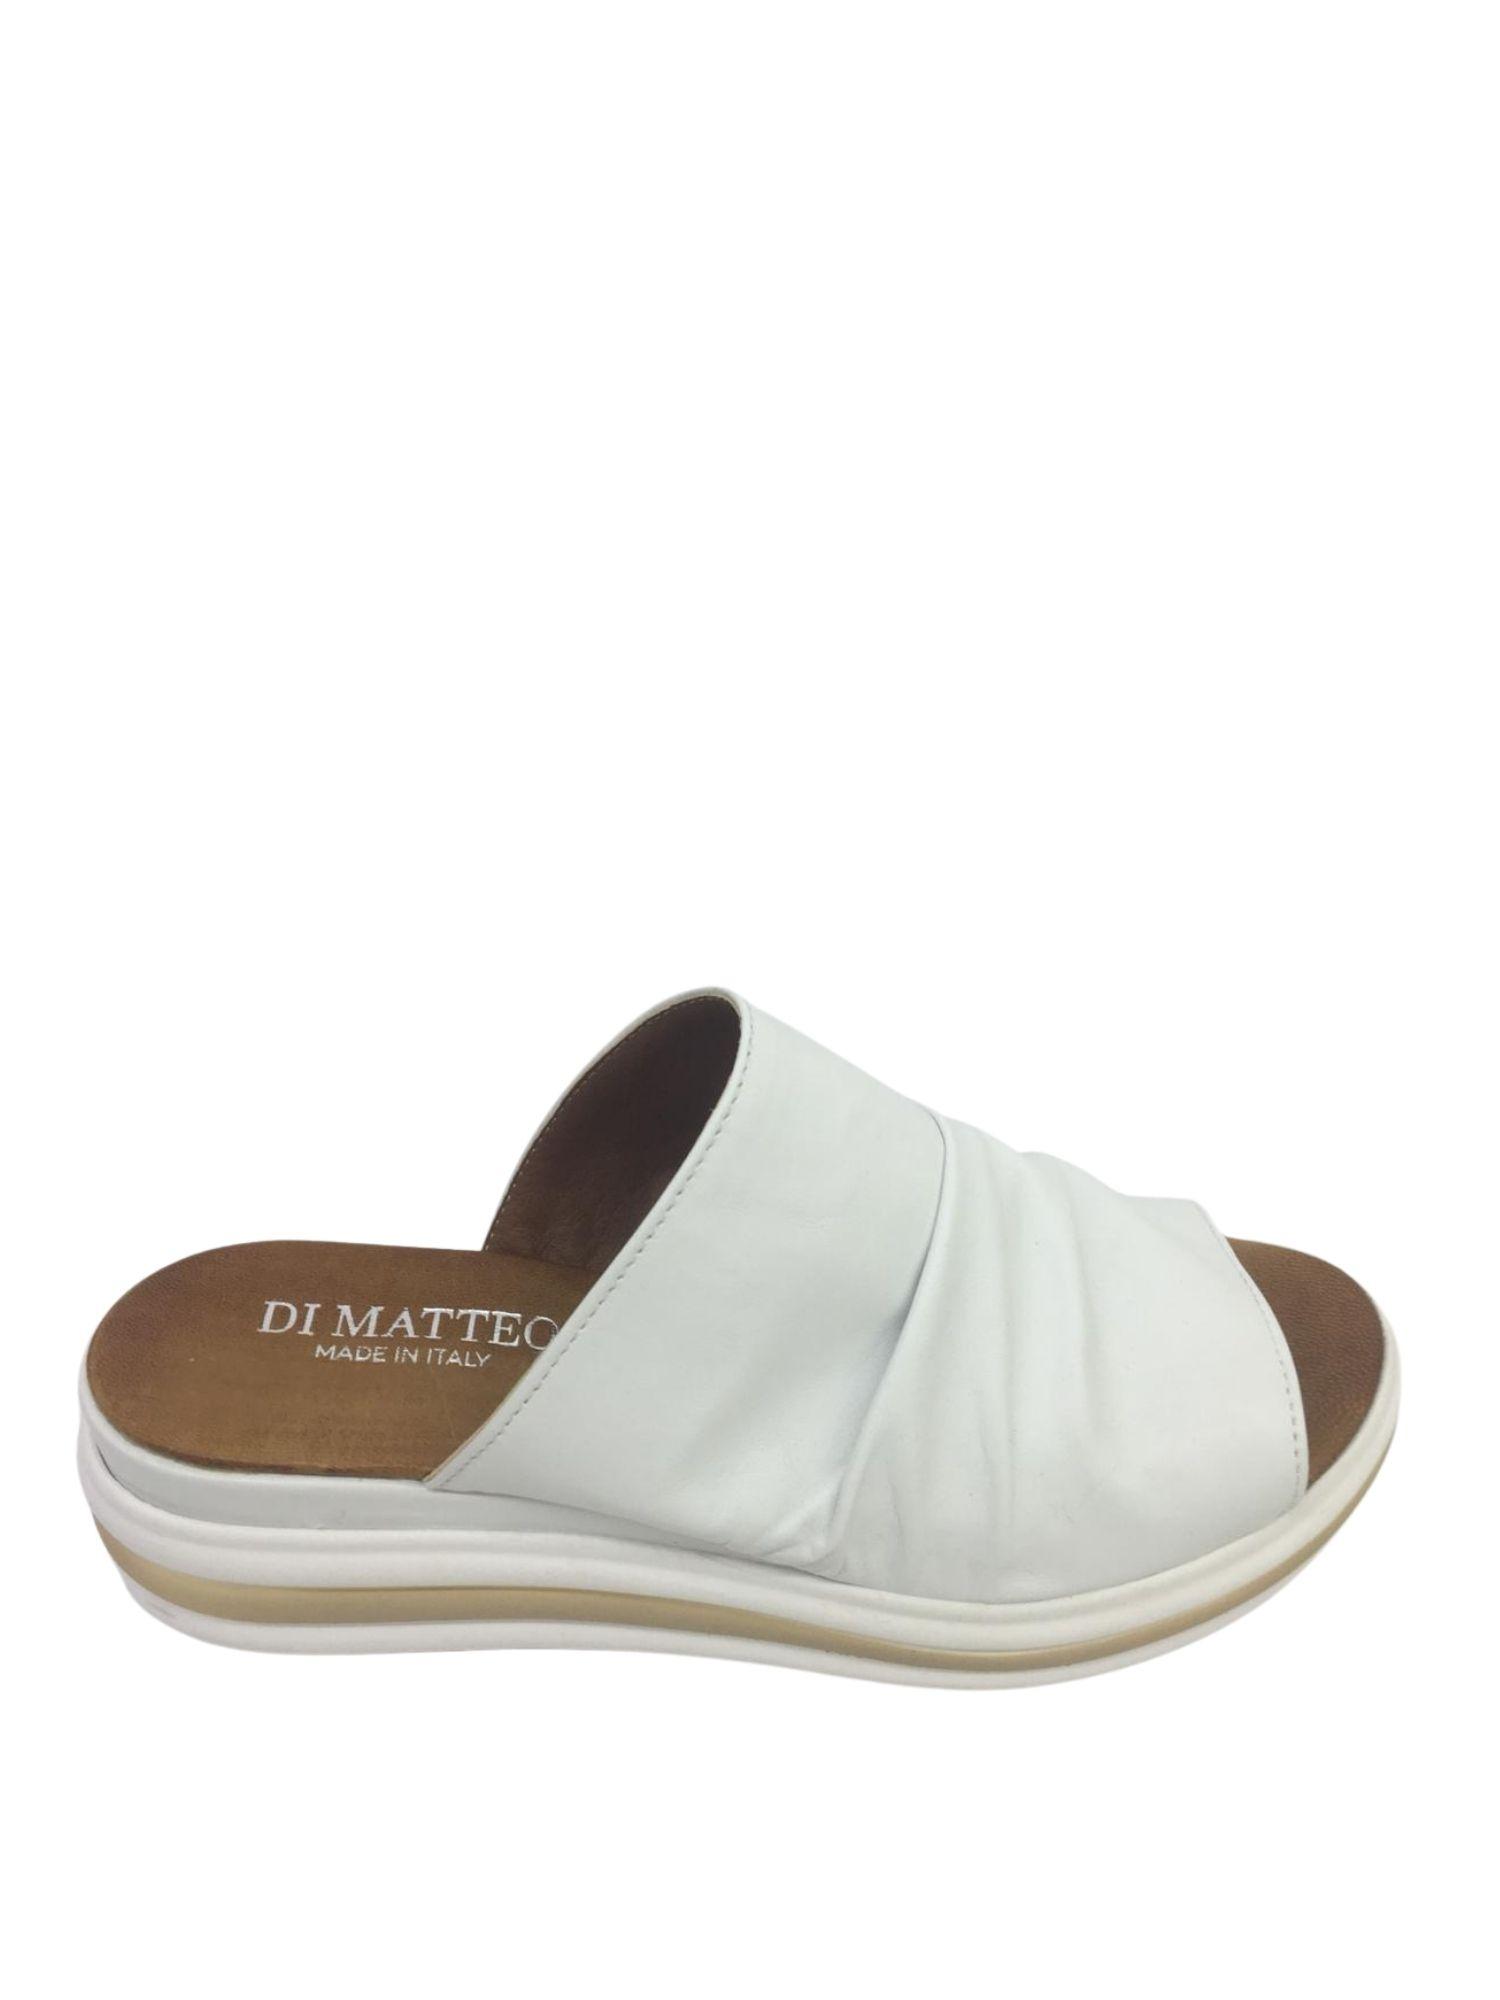 Sandalo Sabot Made in Italy 404 Bianco